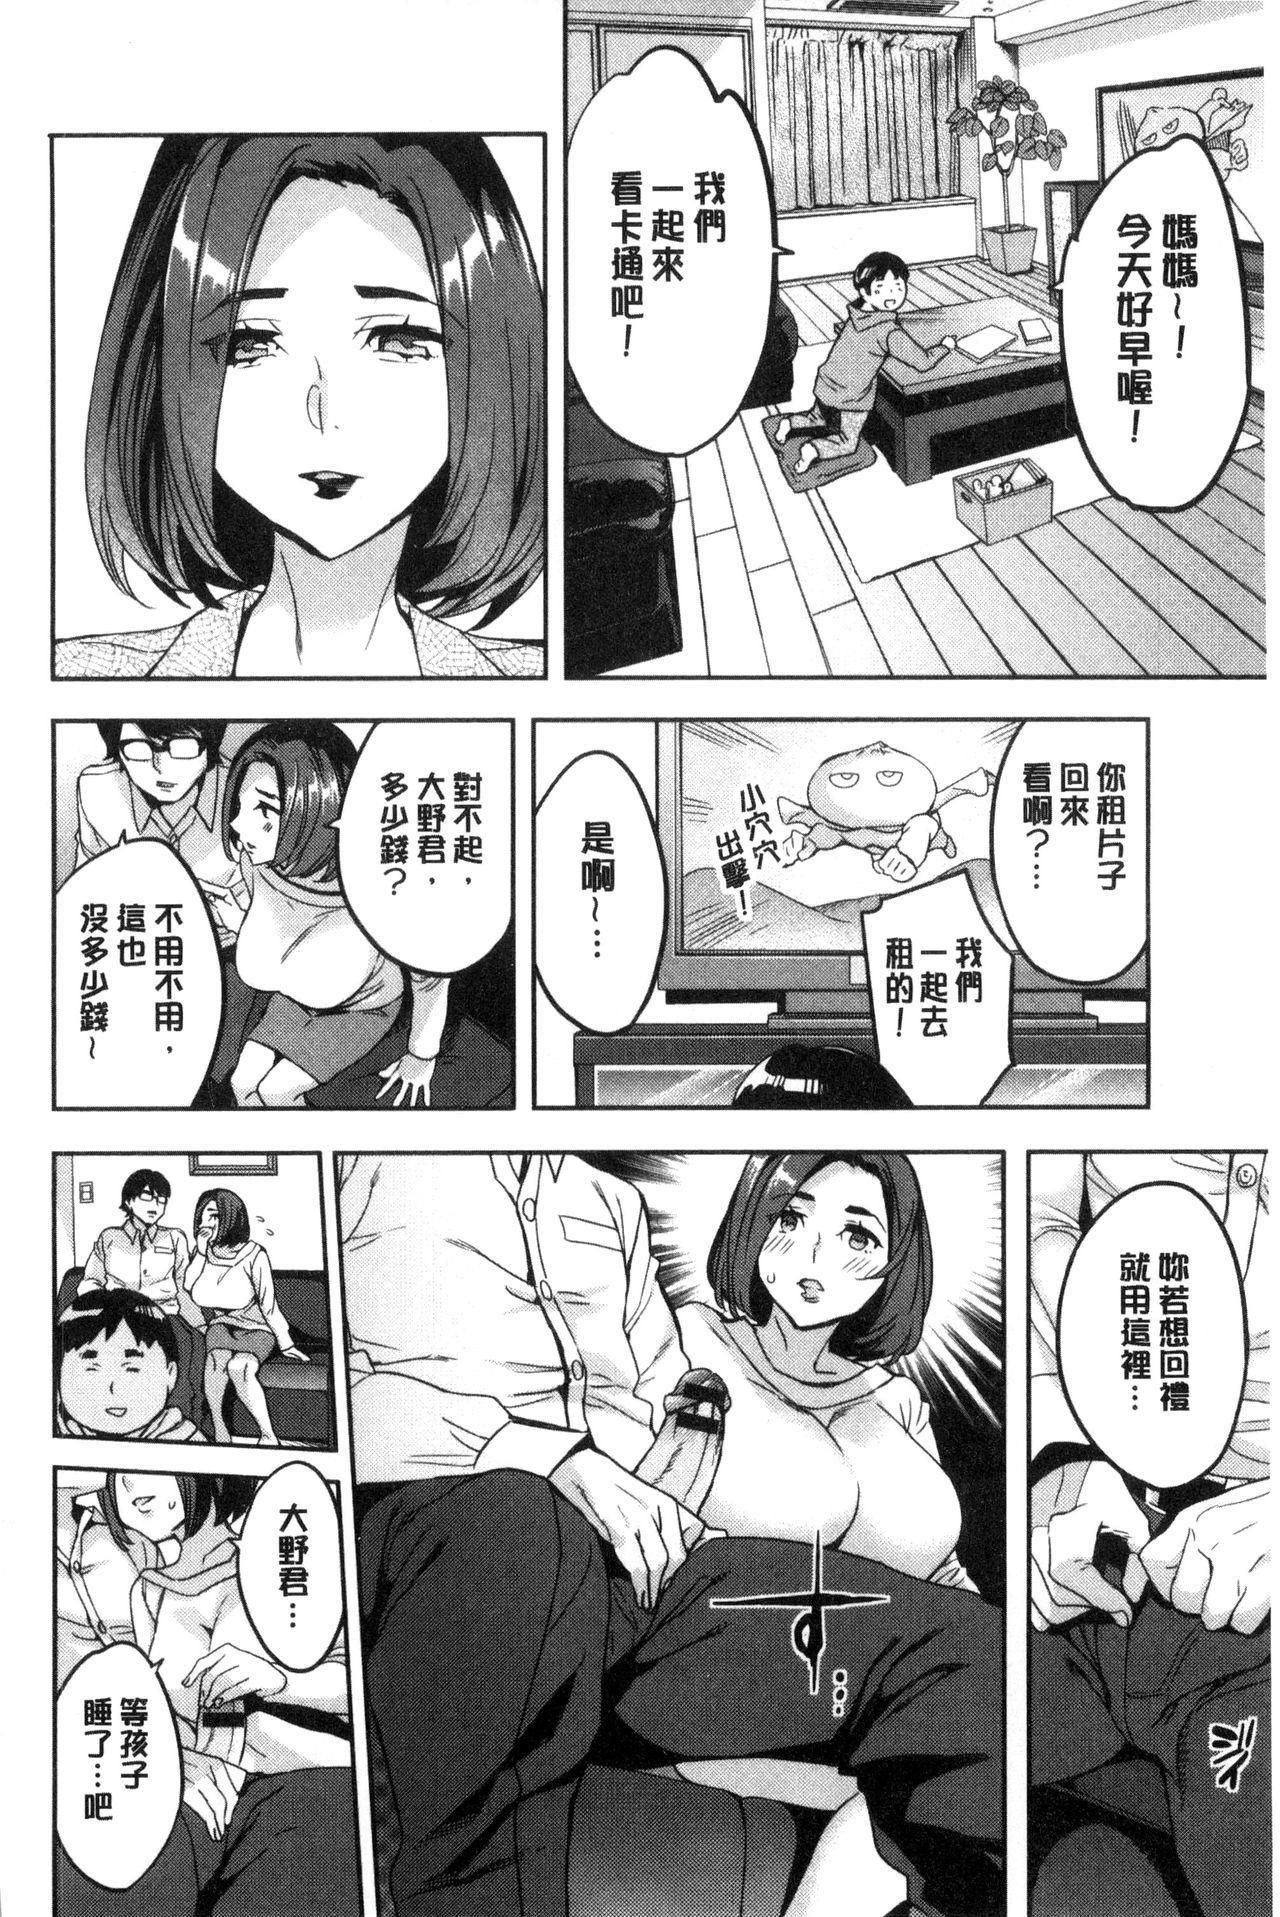 Sekigahara Shouji Hitodumabu   關原商事人妻部 79